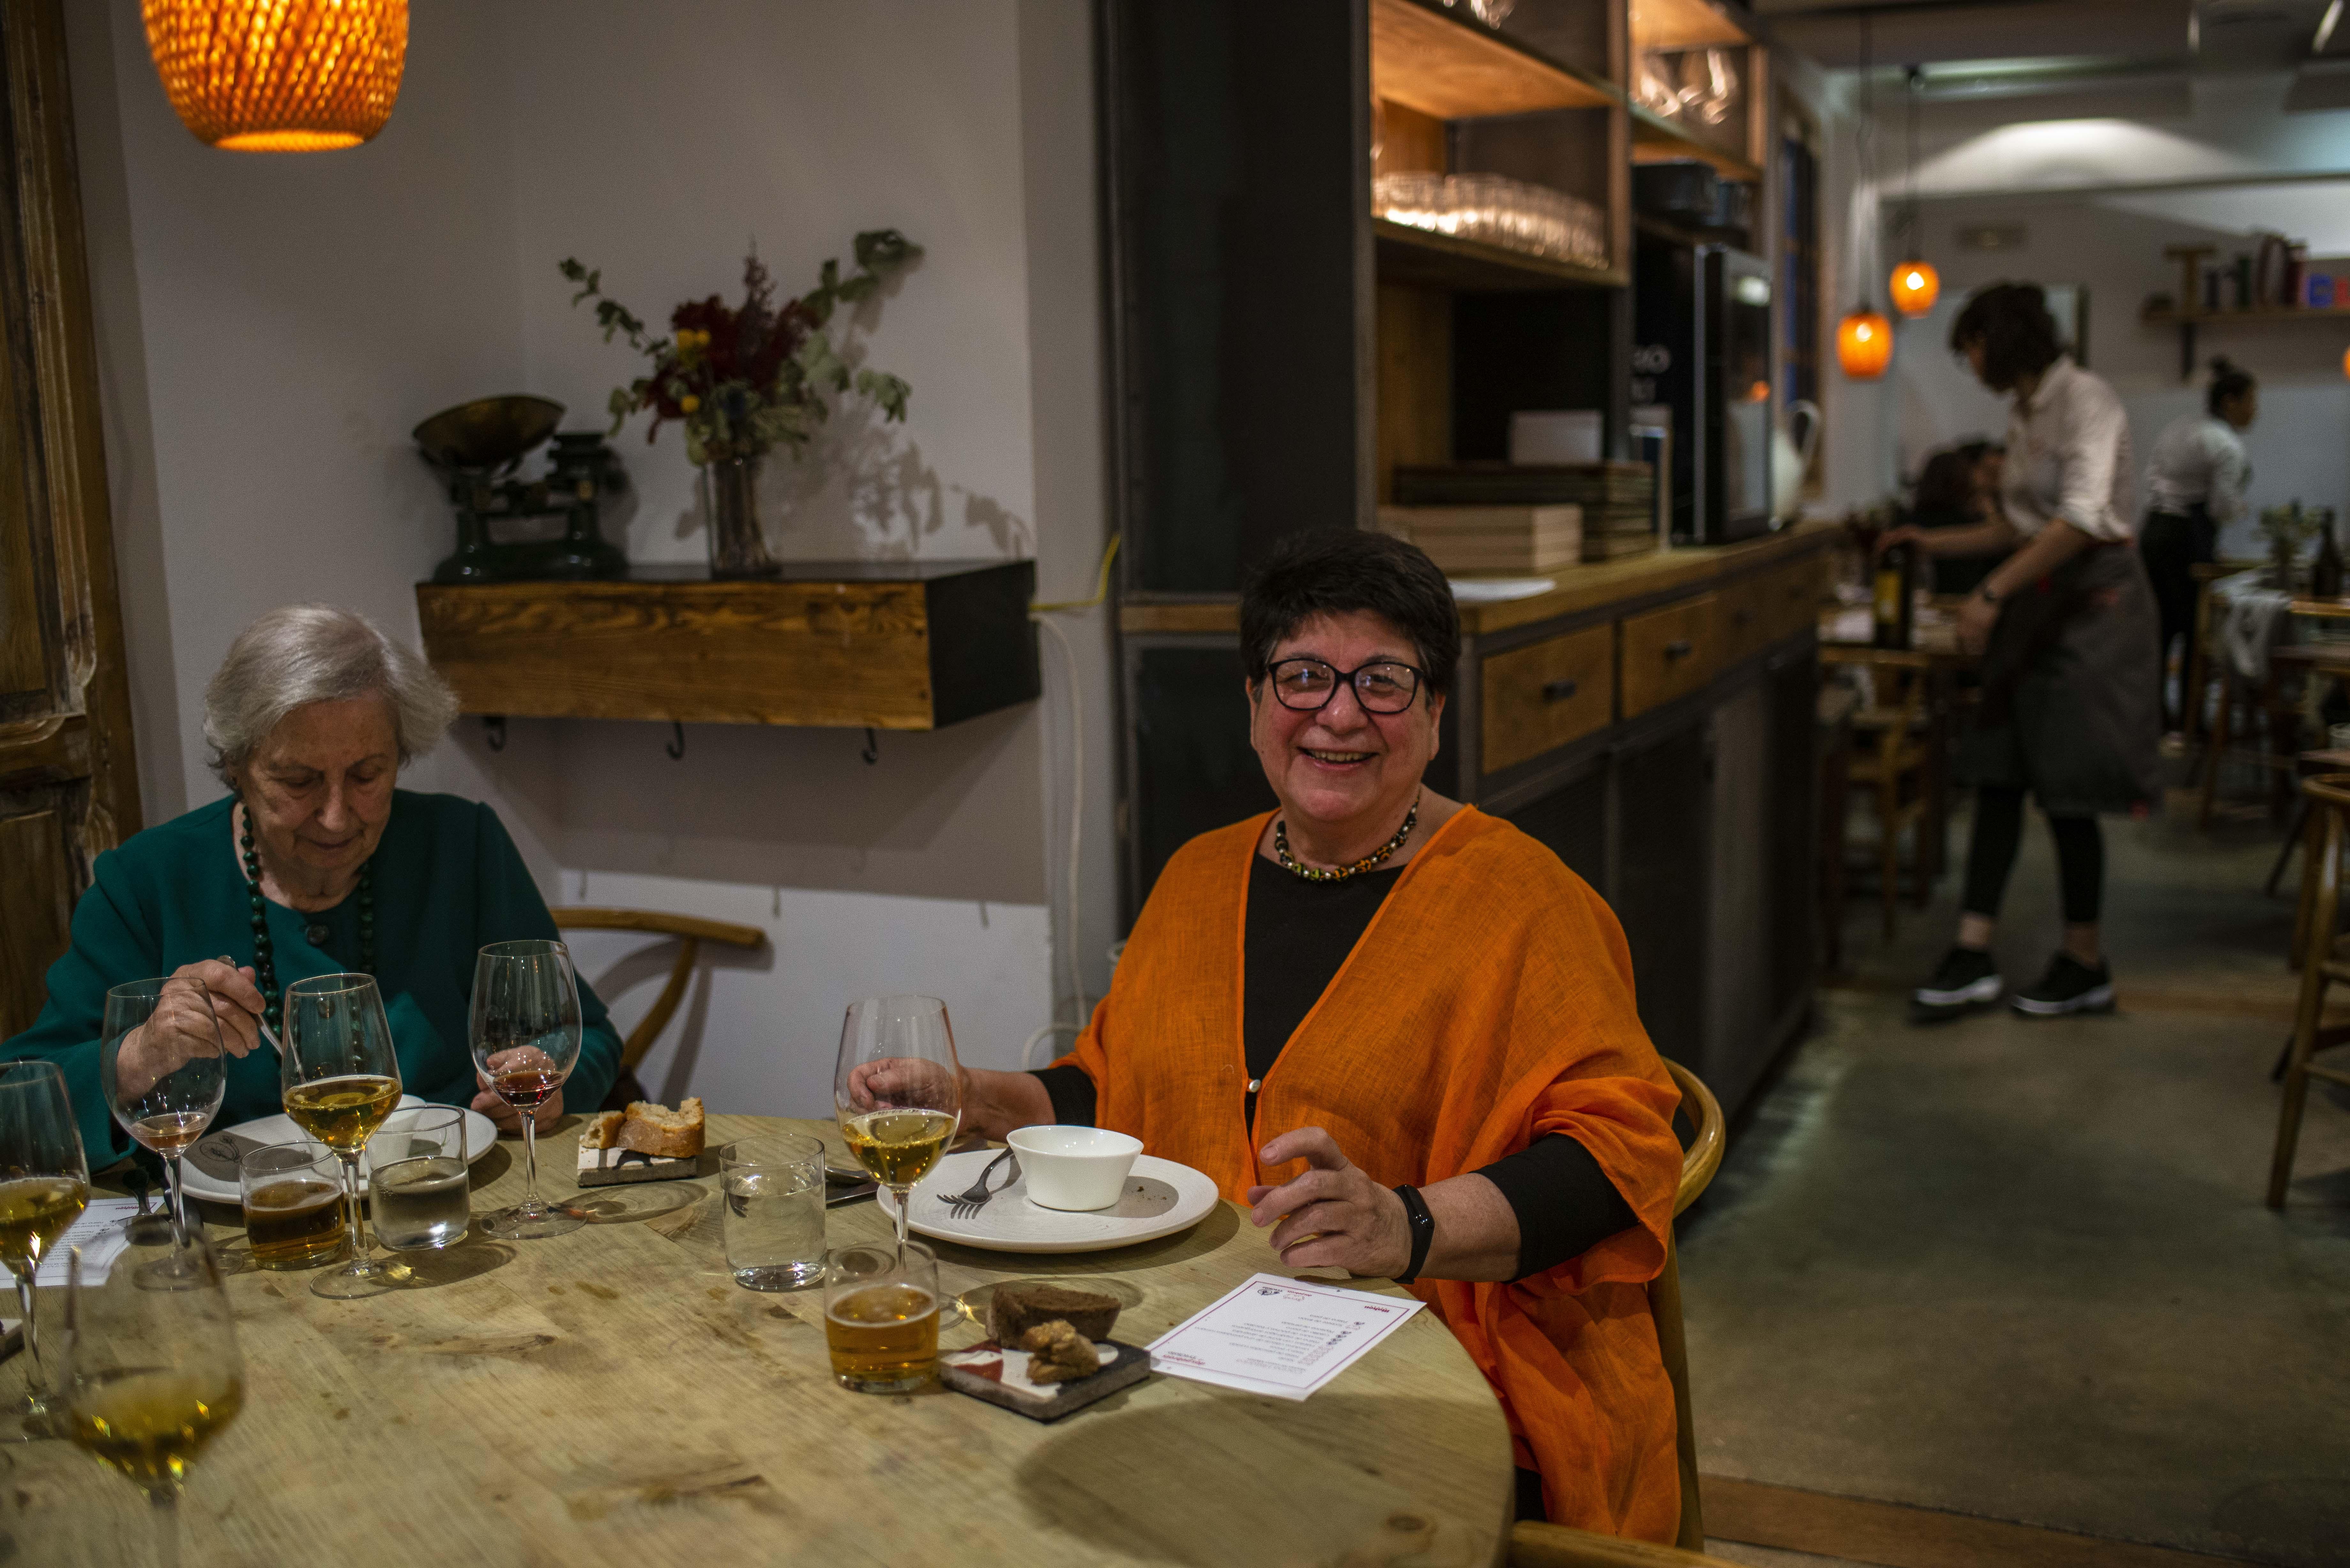 Rosa Tovar ha ayudado a Javier Goya a documentarse para elaborar parte del menú.